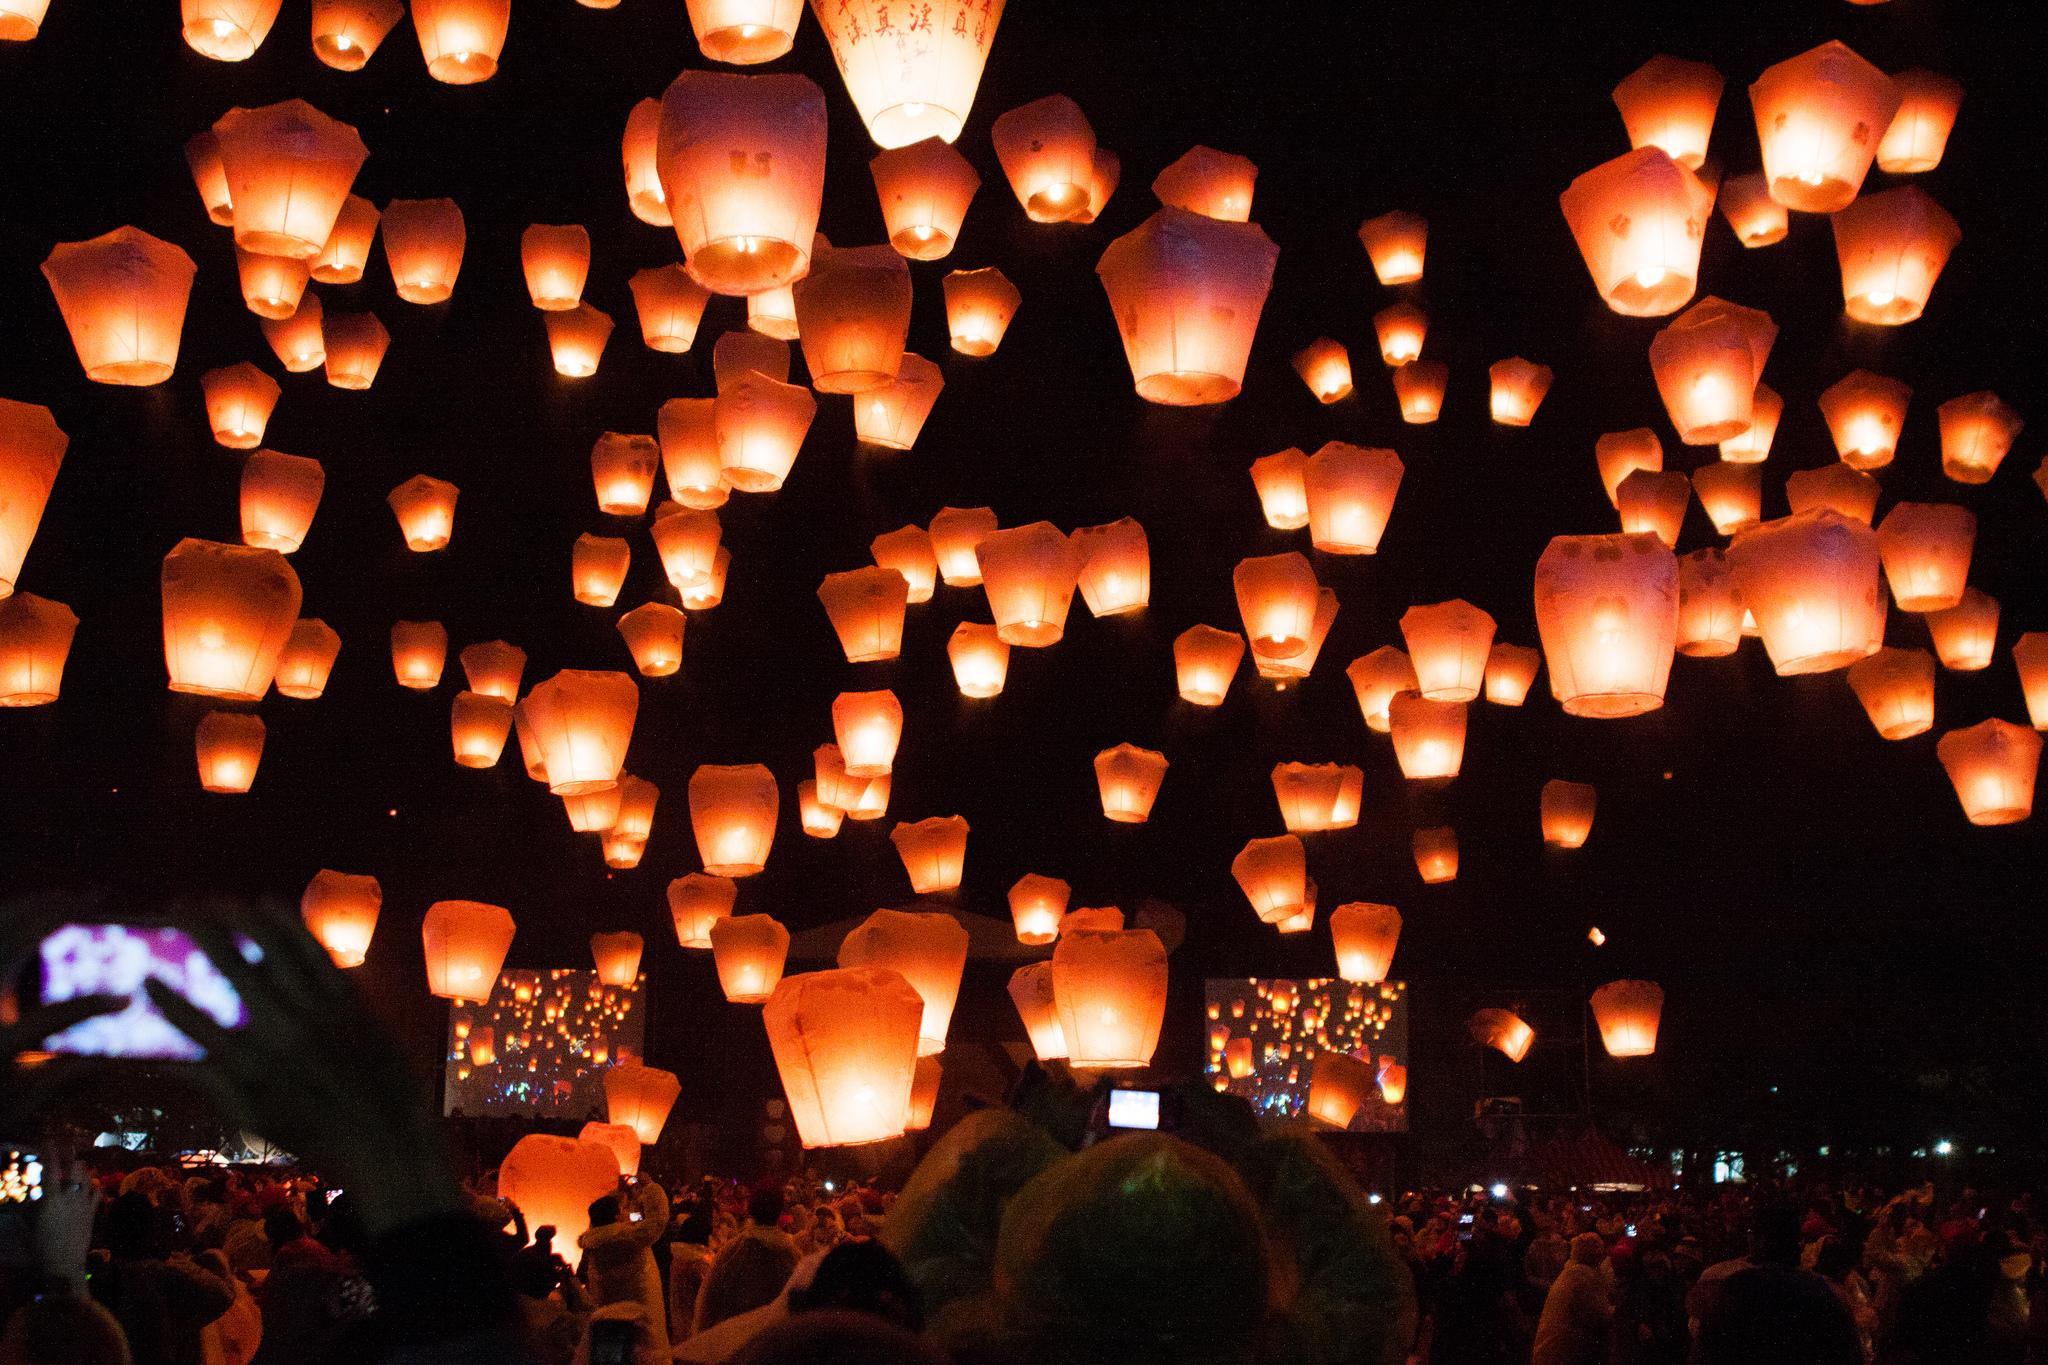 Pingxi Sky Lantern Festival 2014 in Taiwan Photo by Jirka Matousek via Flickr Creative Commons